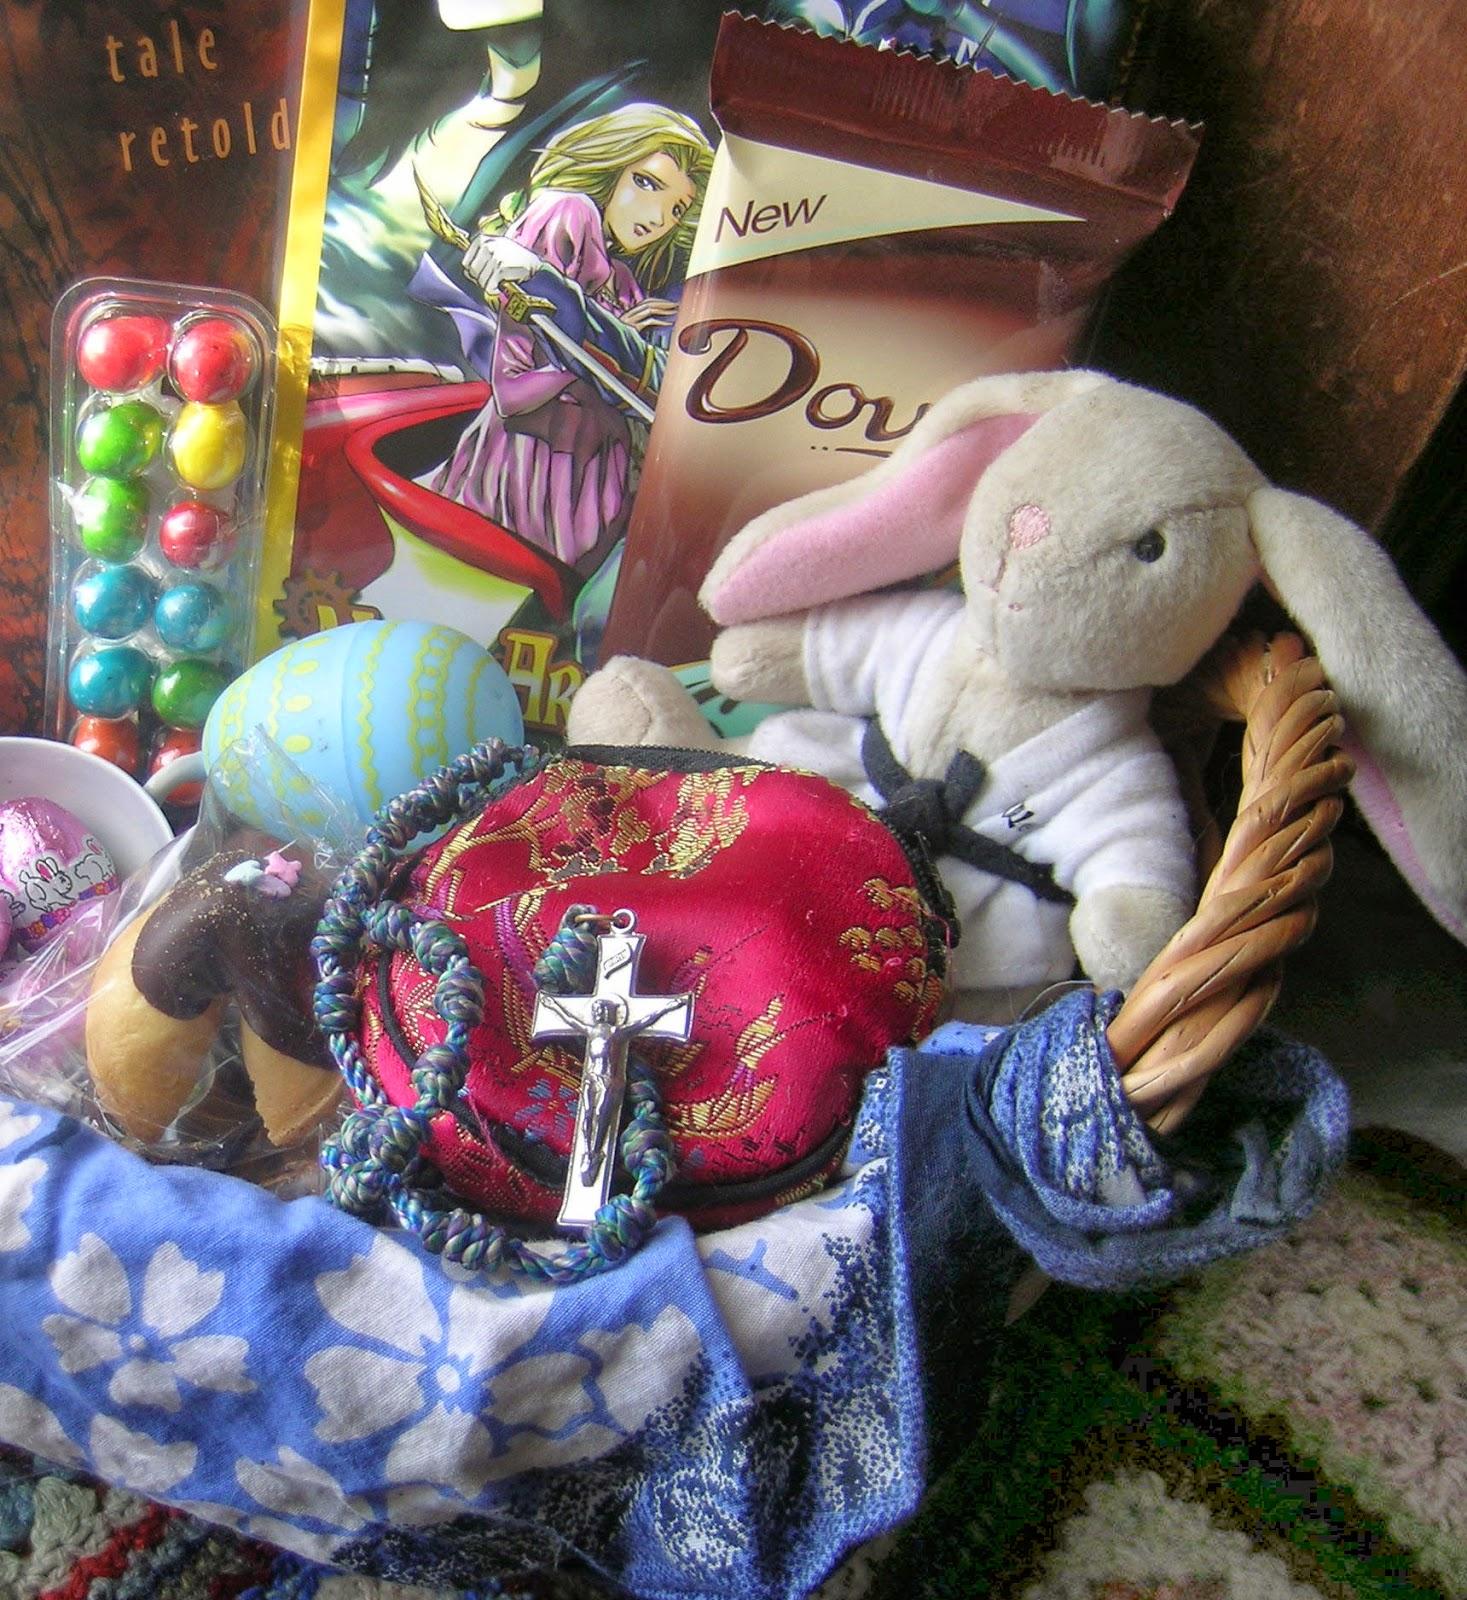 Easter basket tour manga loving teen girl chestertonpress manga loving teen girl negle Gallery